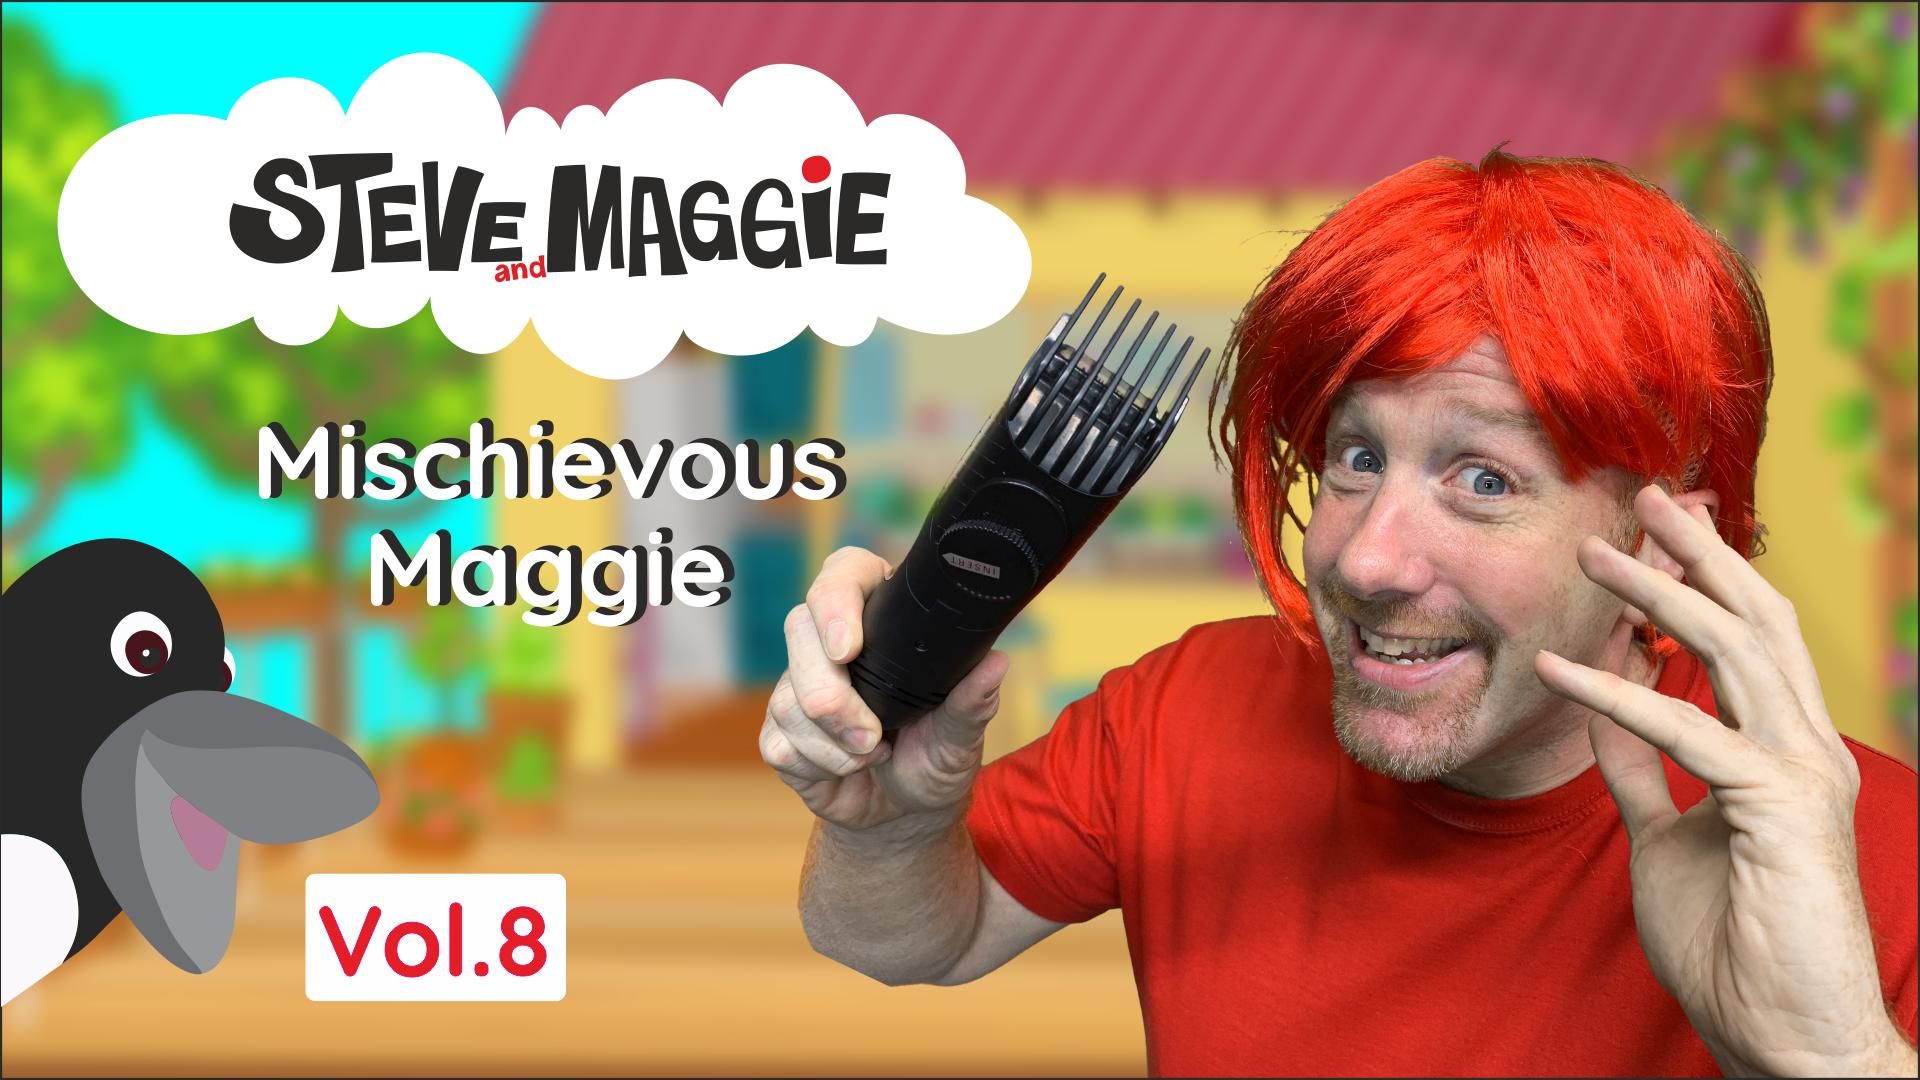 Steve and Maggie - Mischievous Maggie (Vol. 8)